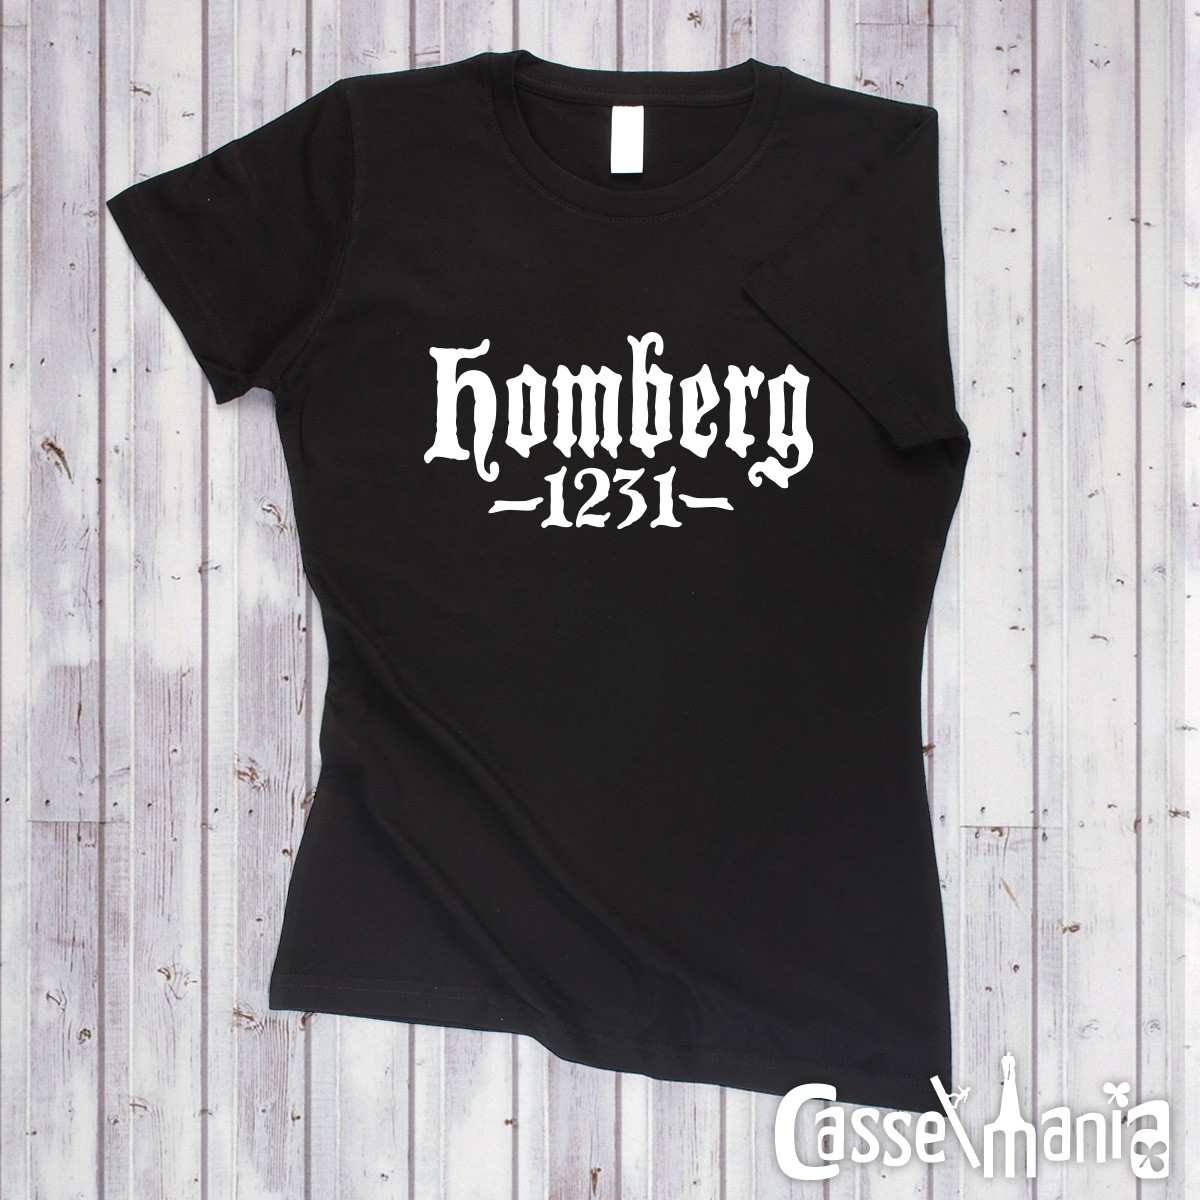 Homberg - 1231, für Mäjen